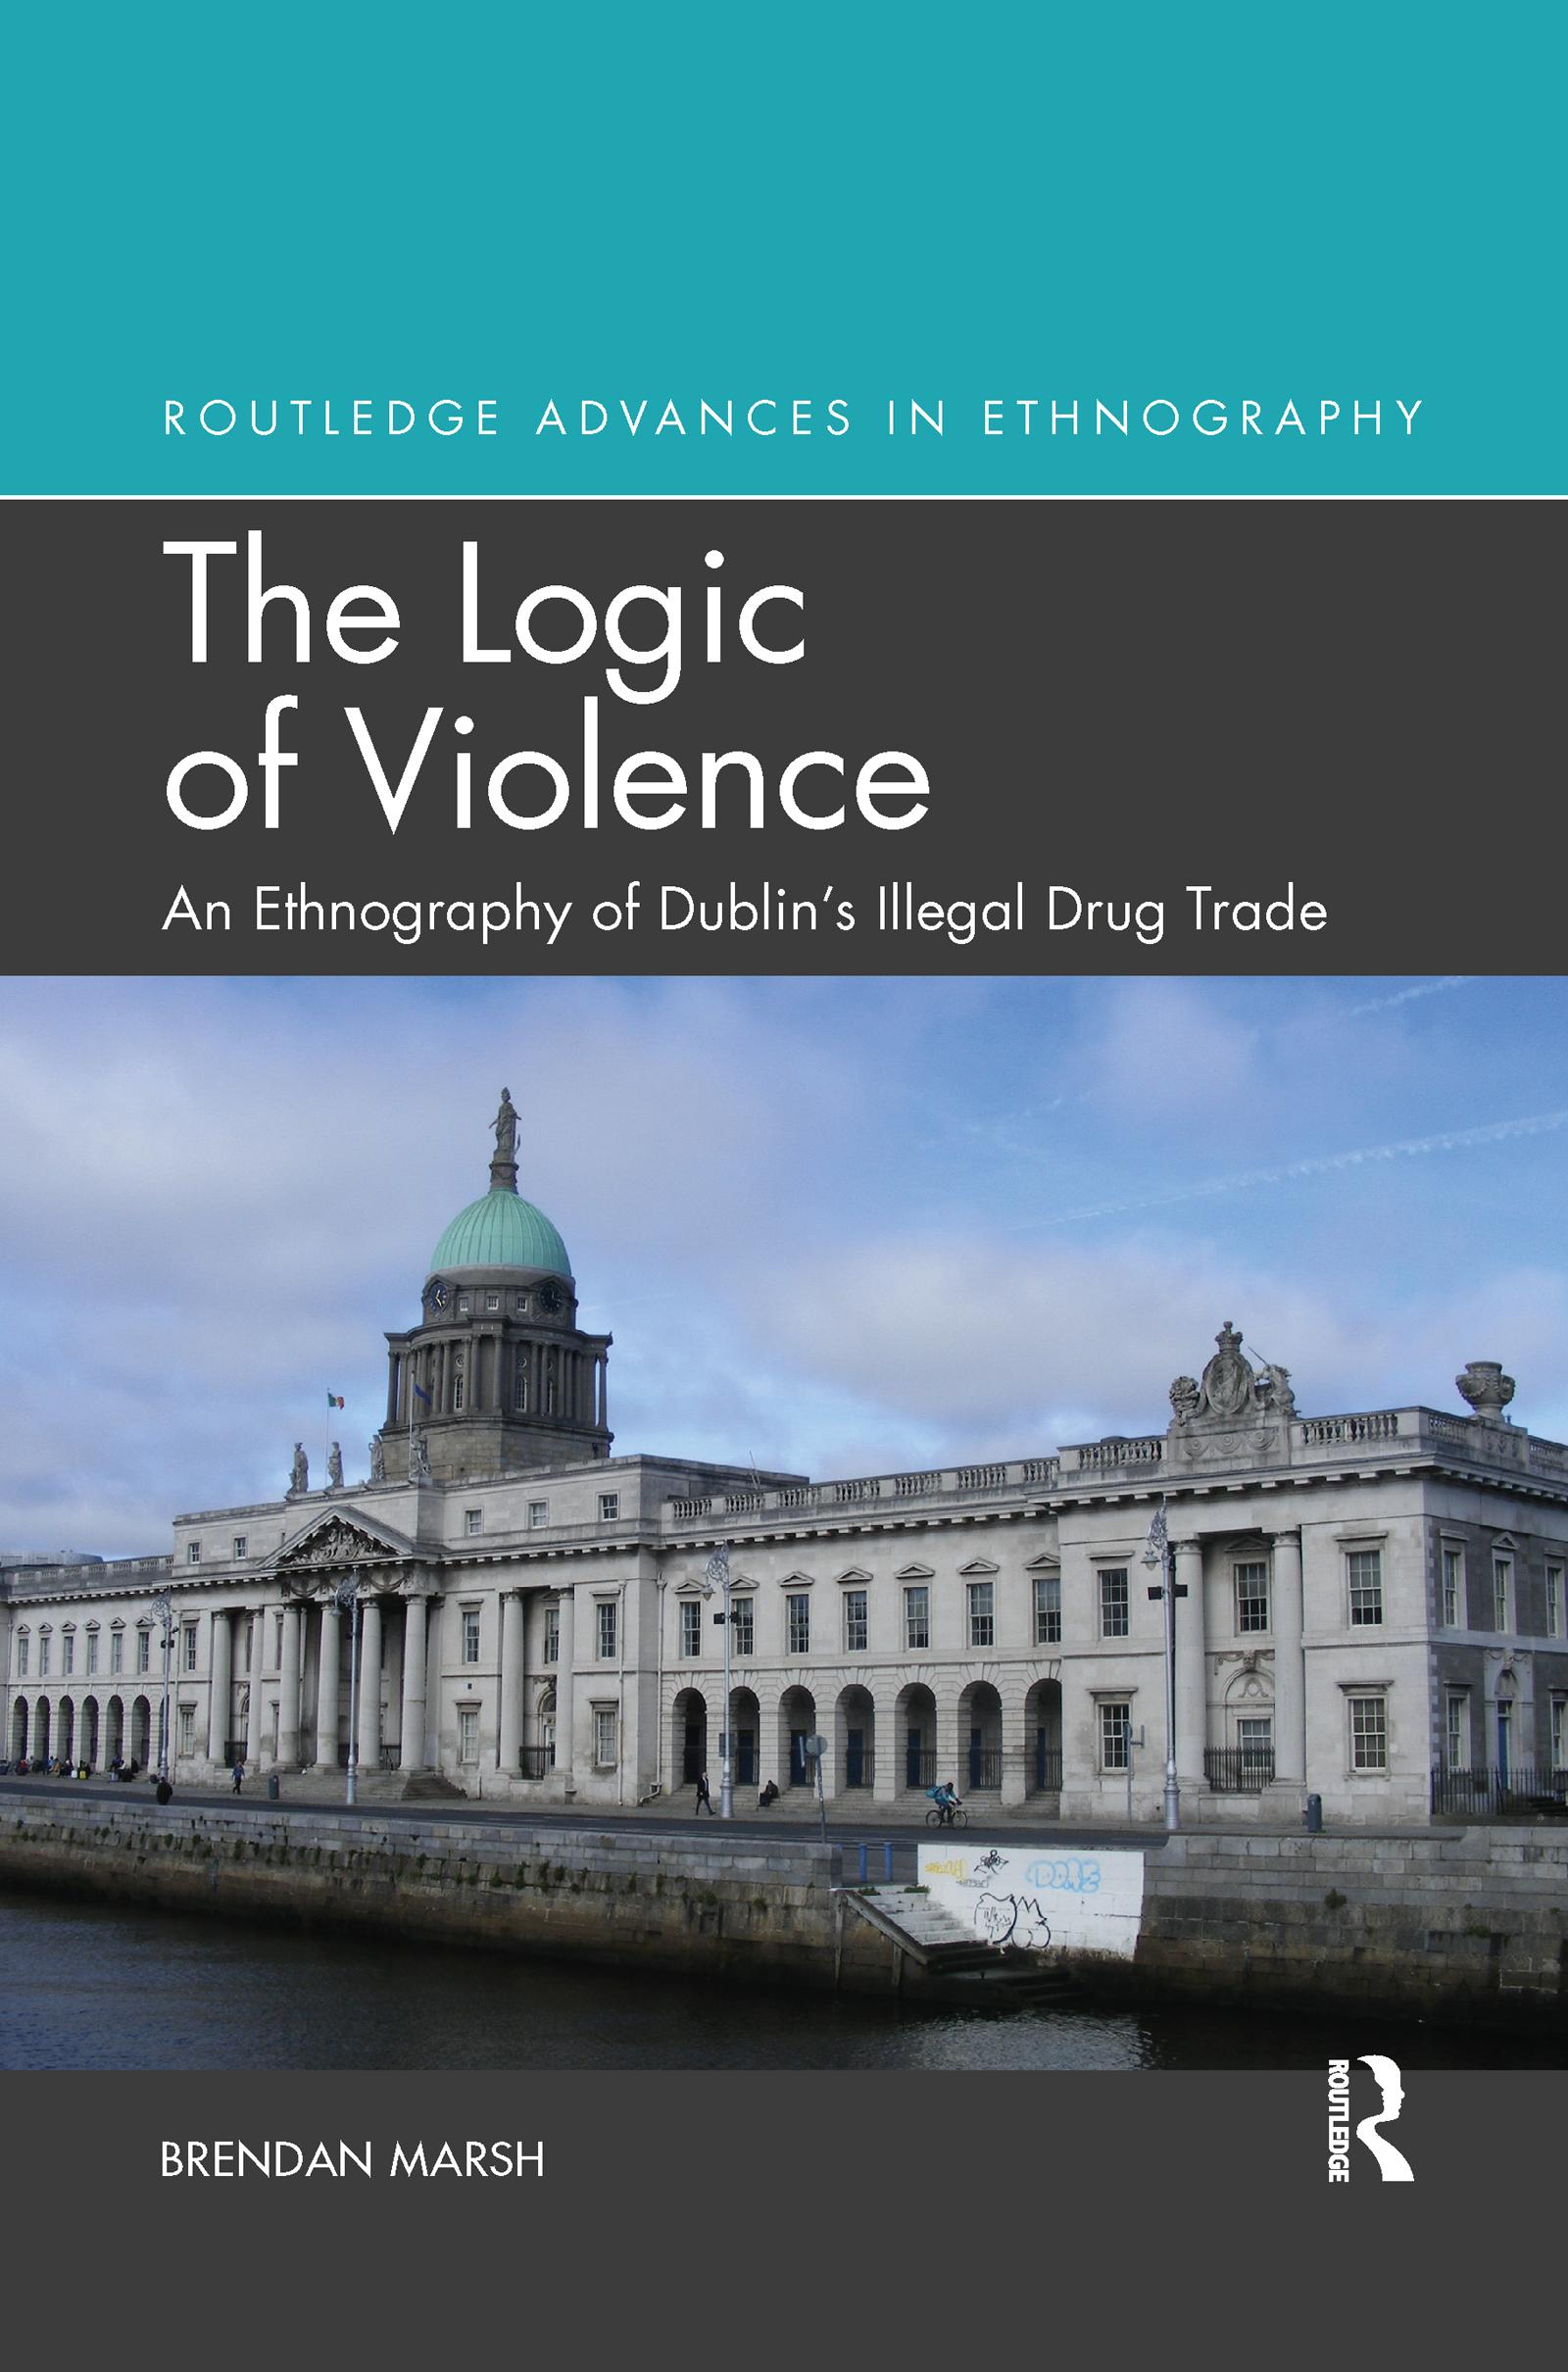 The Logic of Violence